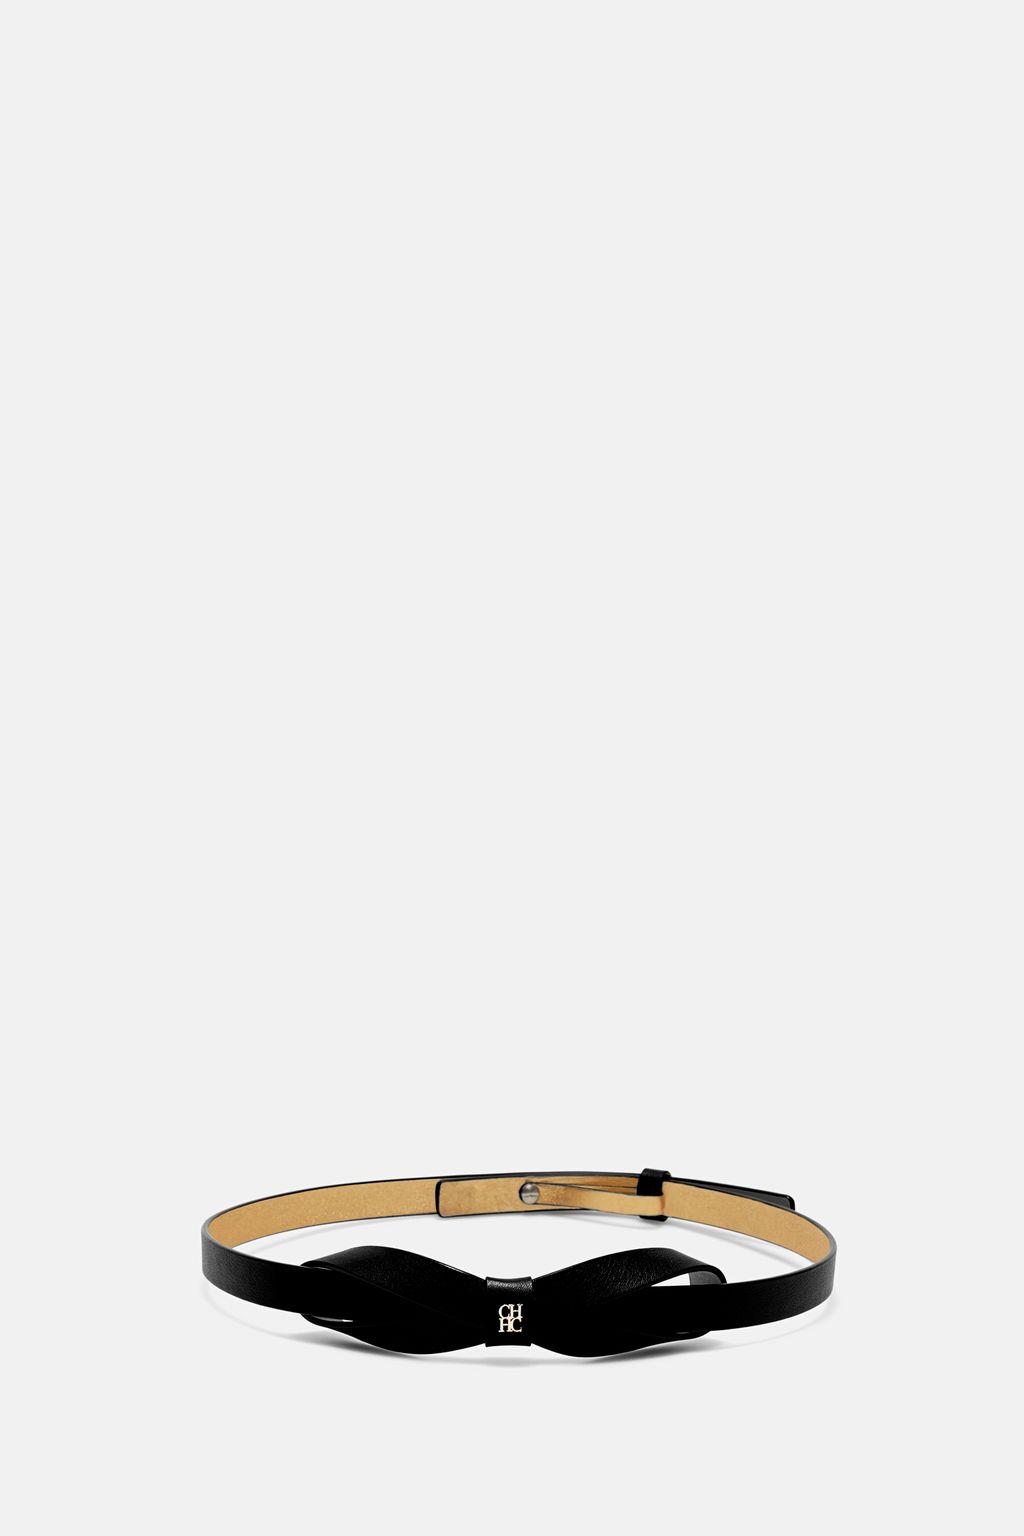 CH Ribbon leather belt